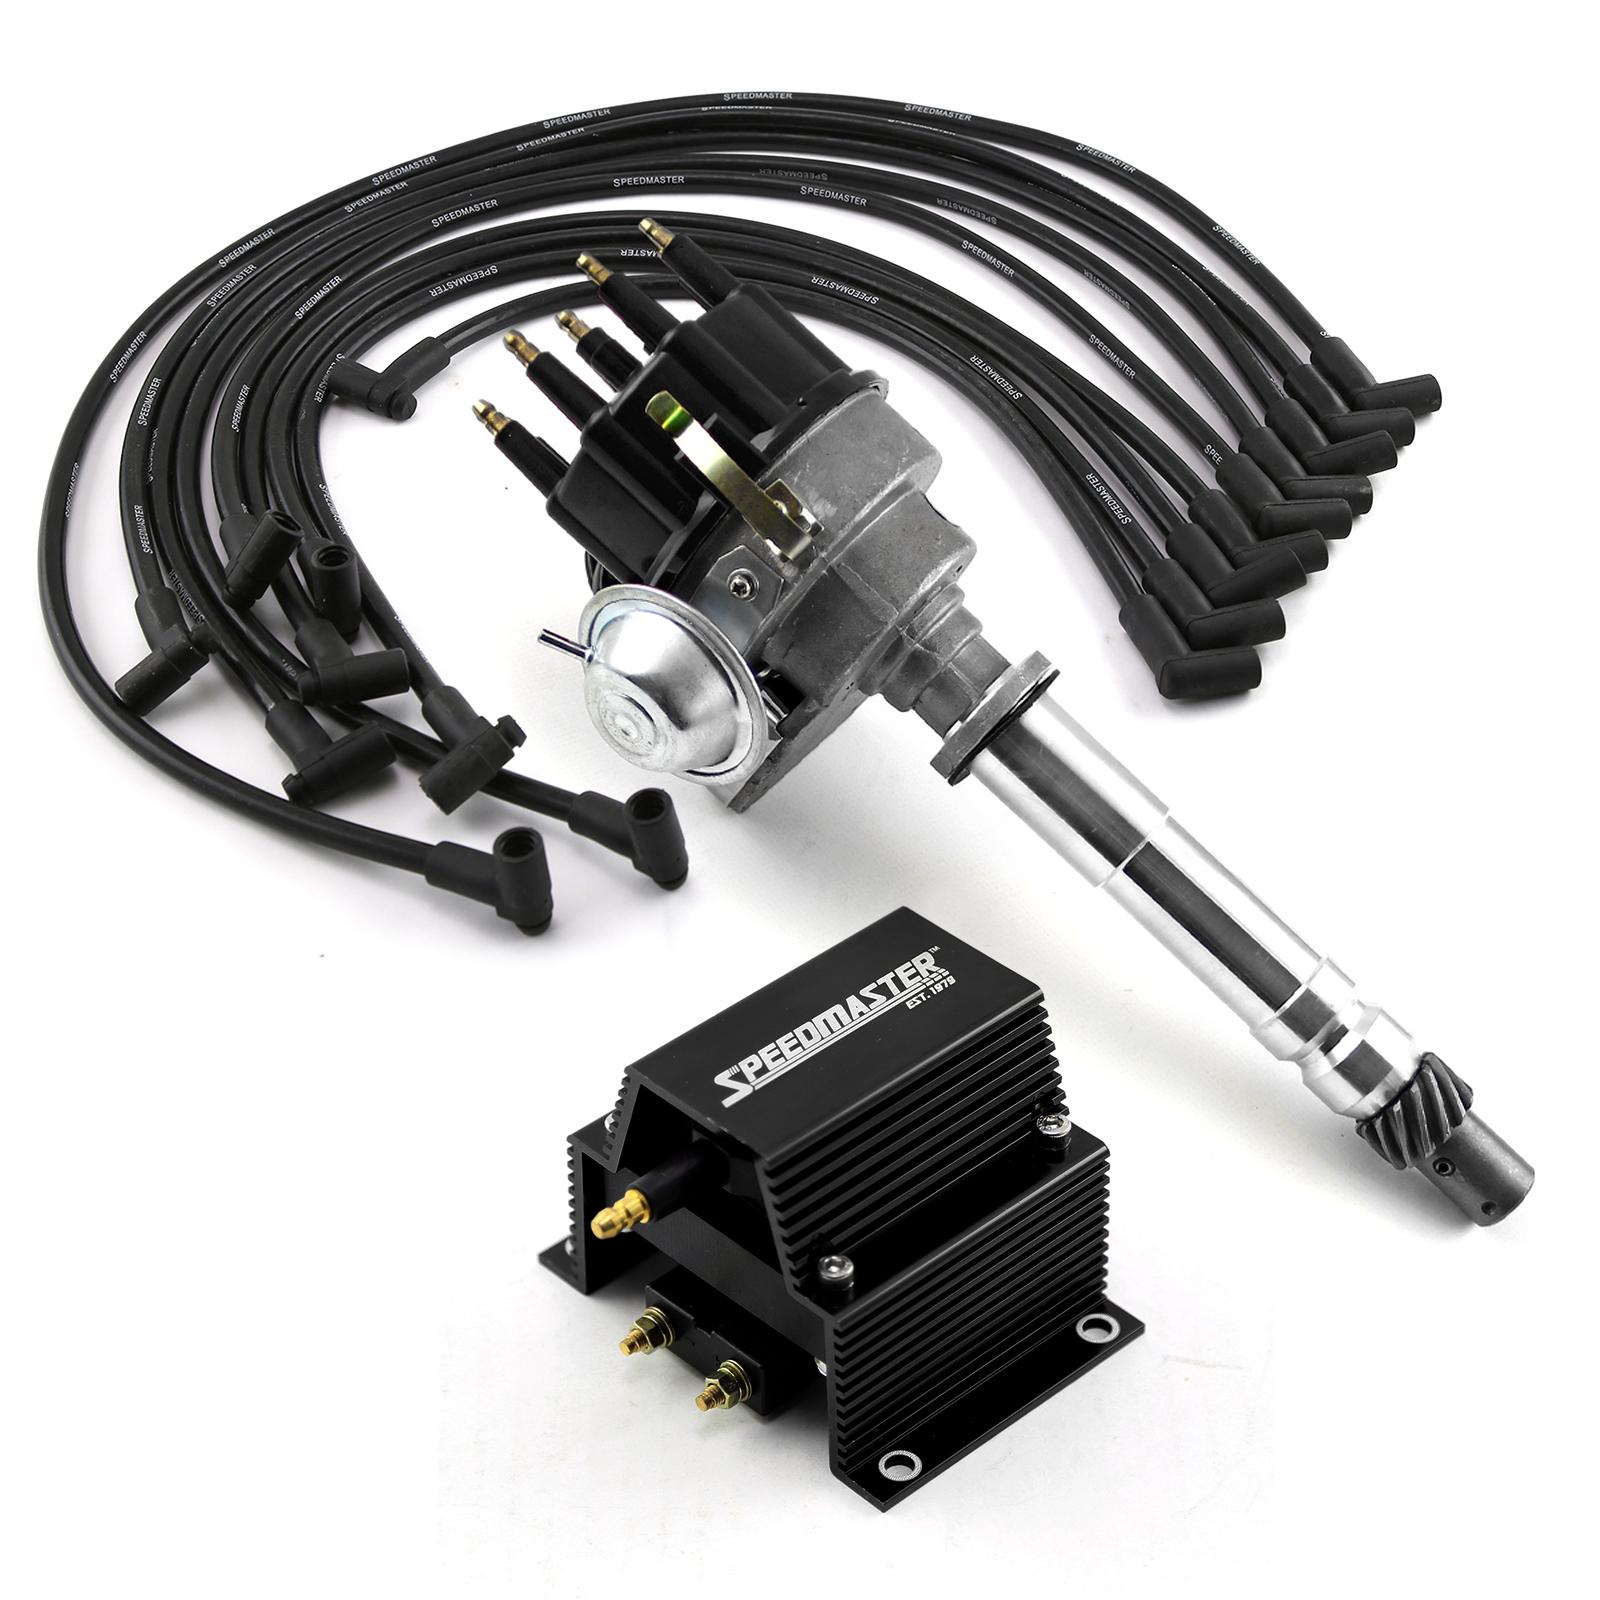 Chevy SBC 350 BBC 454 Ready-to-run Black Ignition Distributor Combo